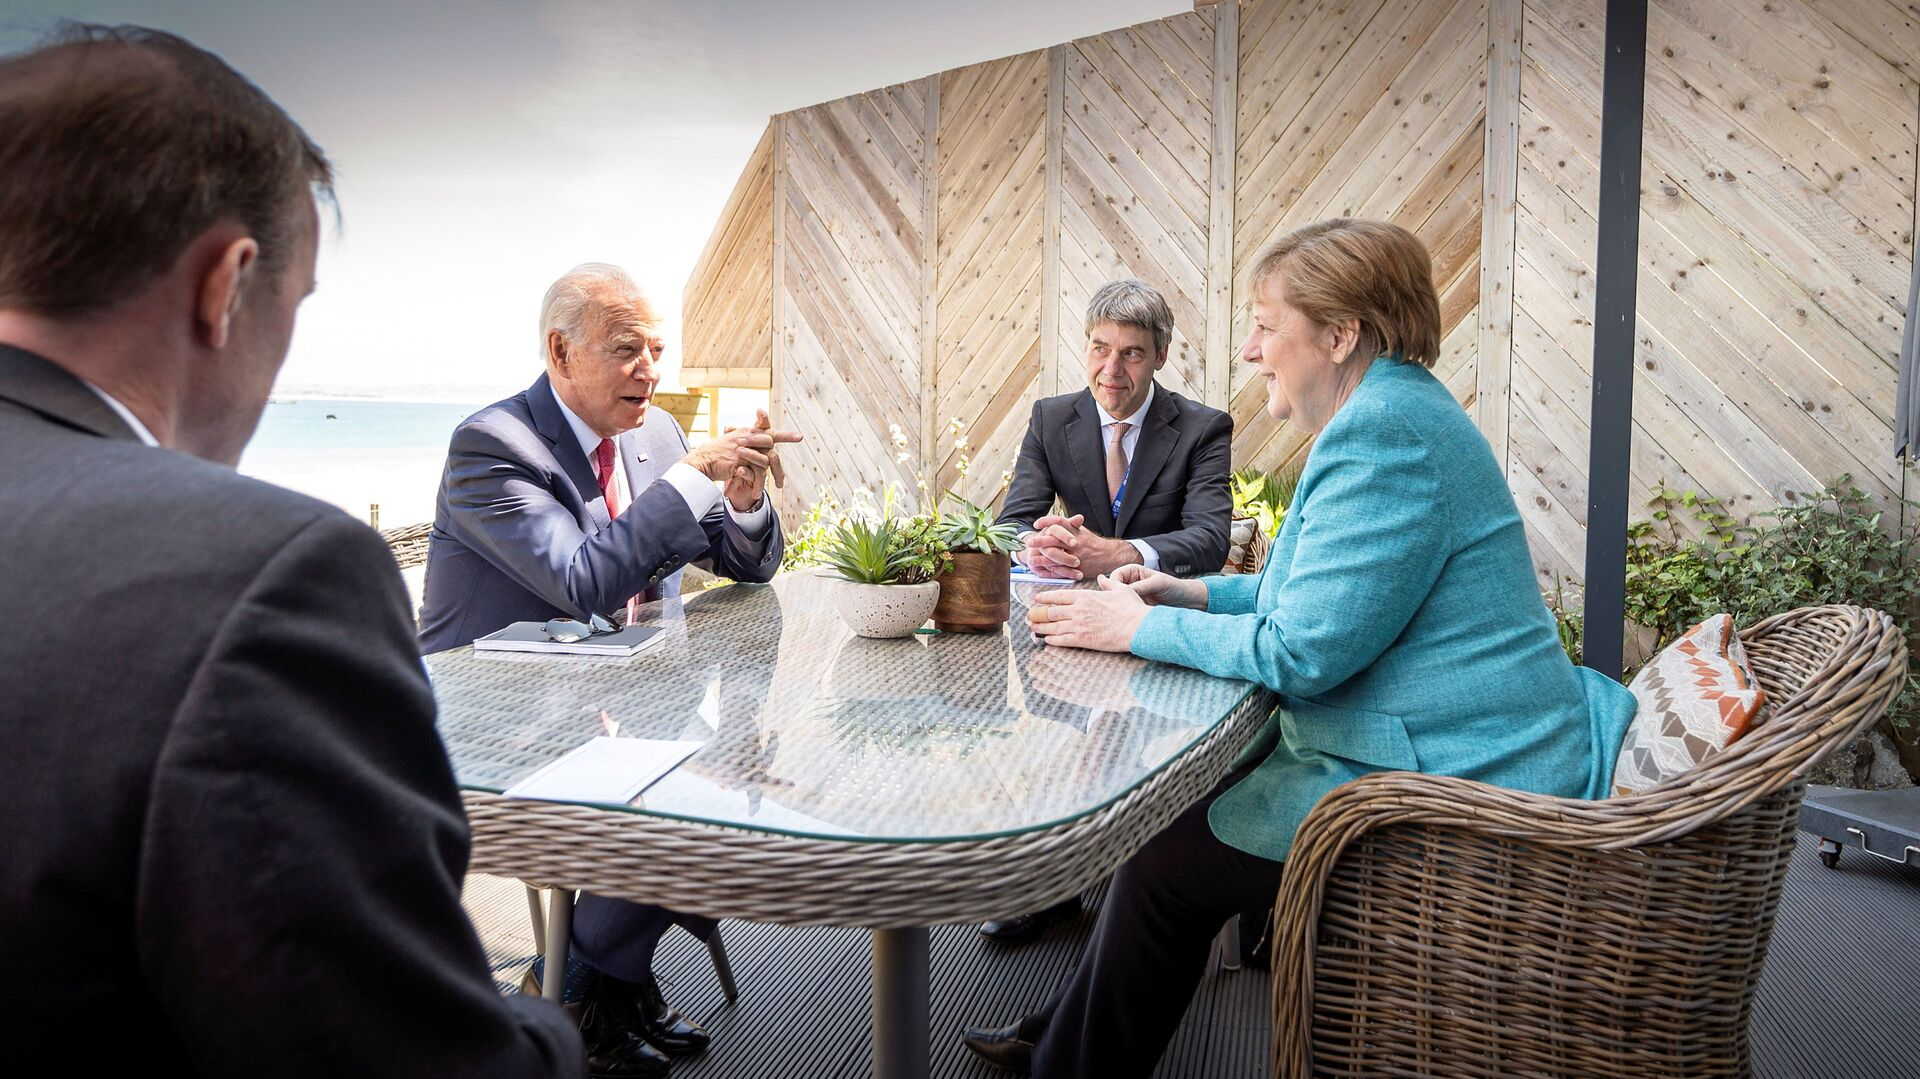 Biden e Merkel a Cornovaglia - Sputnik Italia, 1920, 15.06.2021